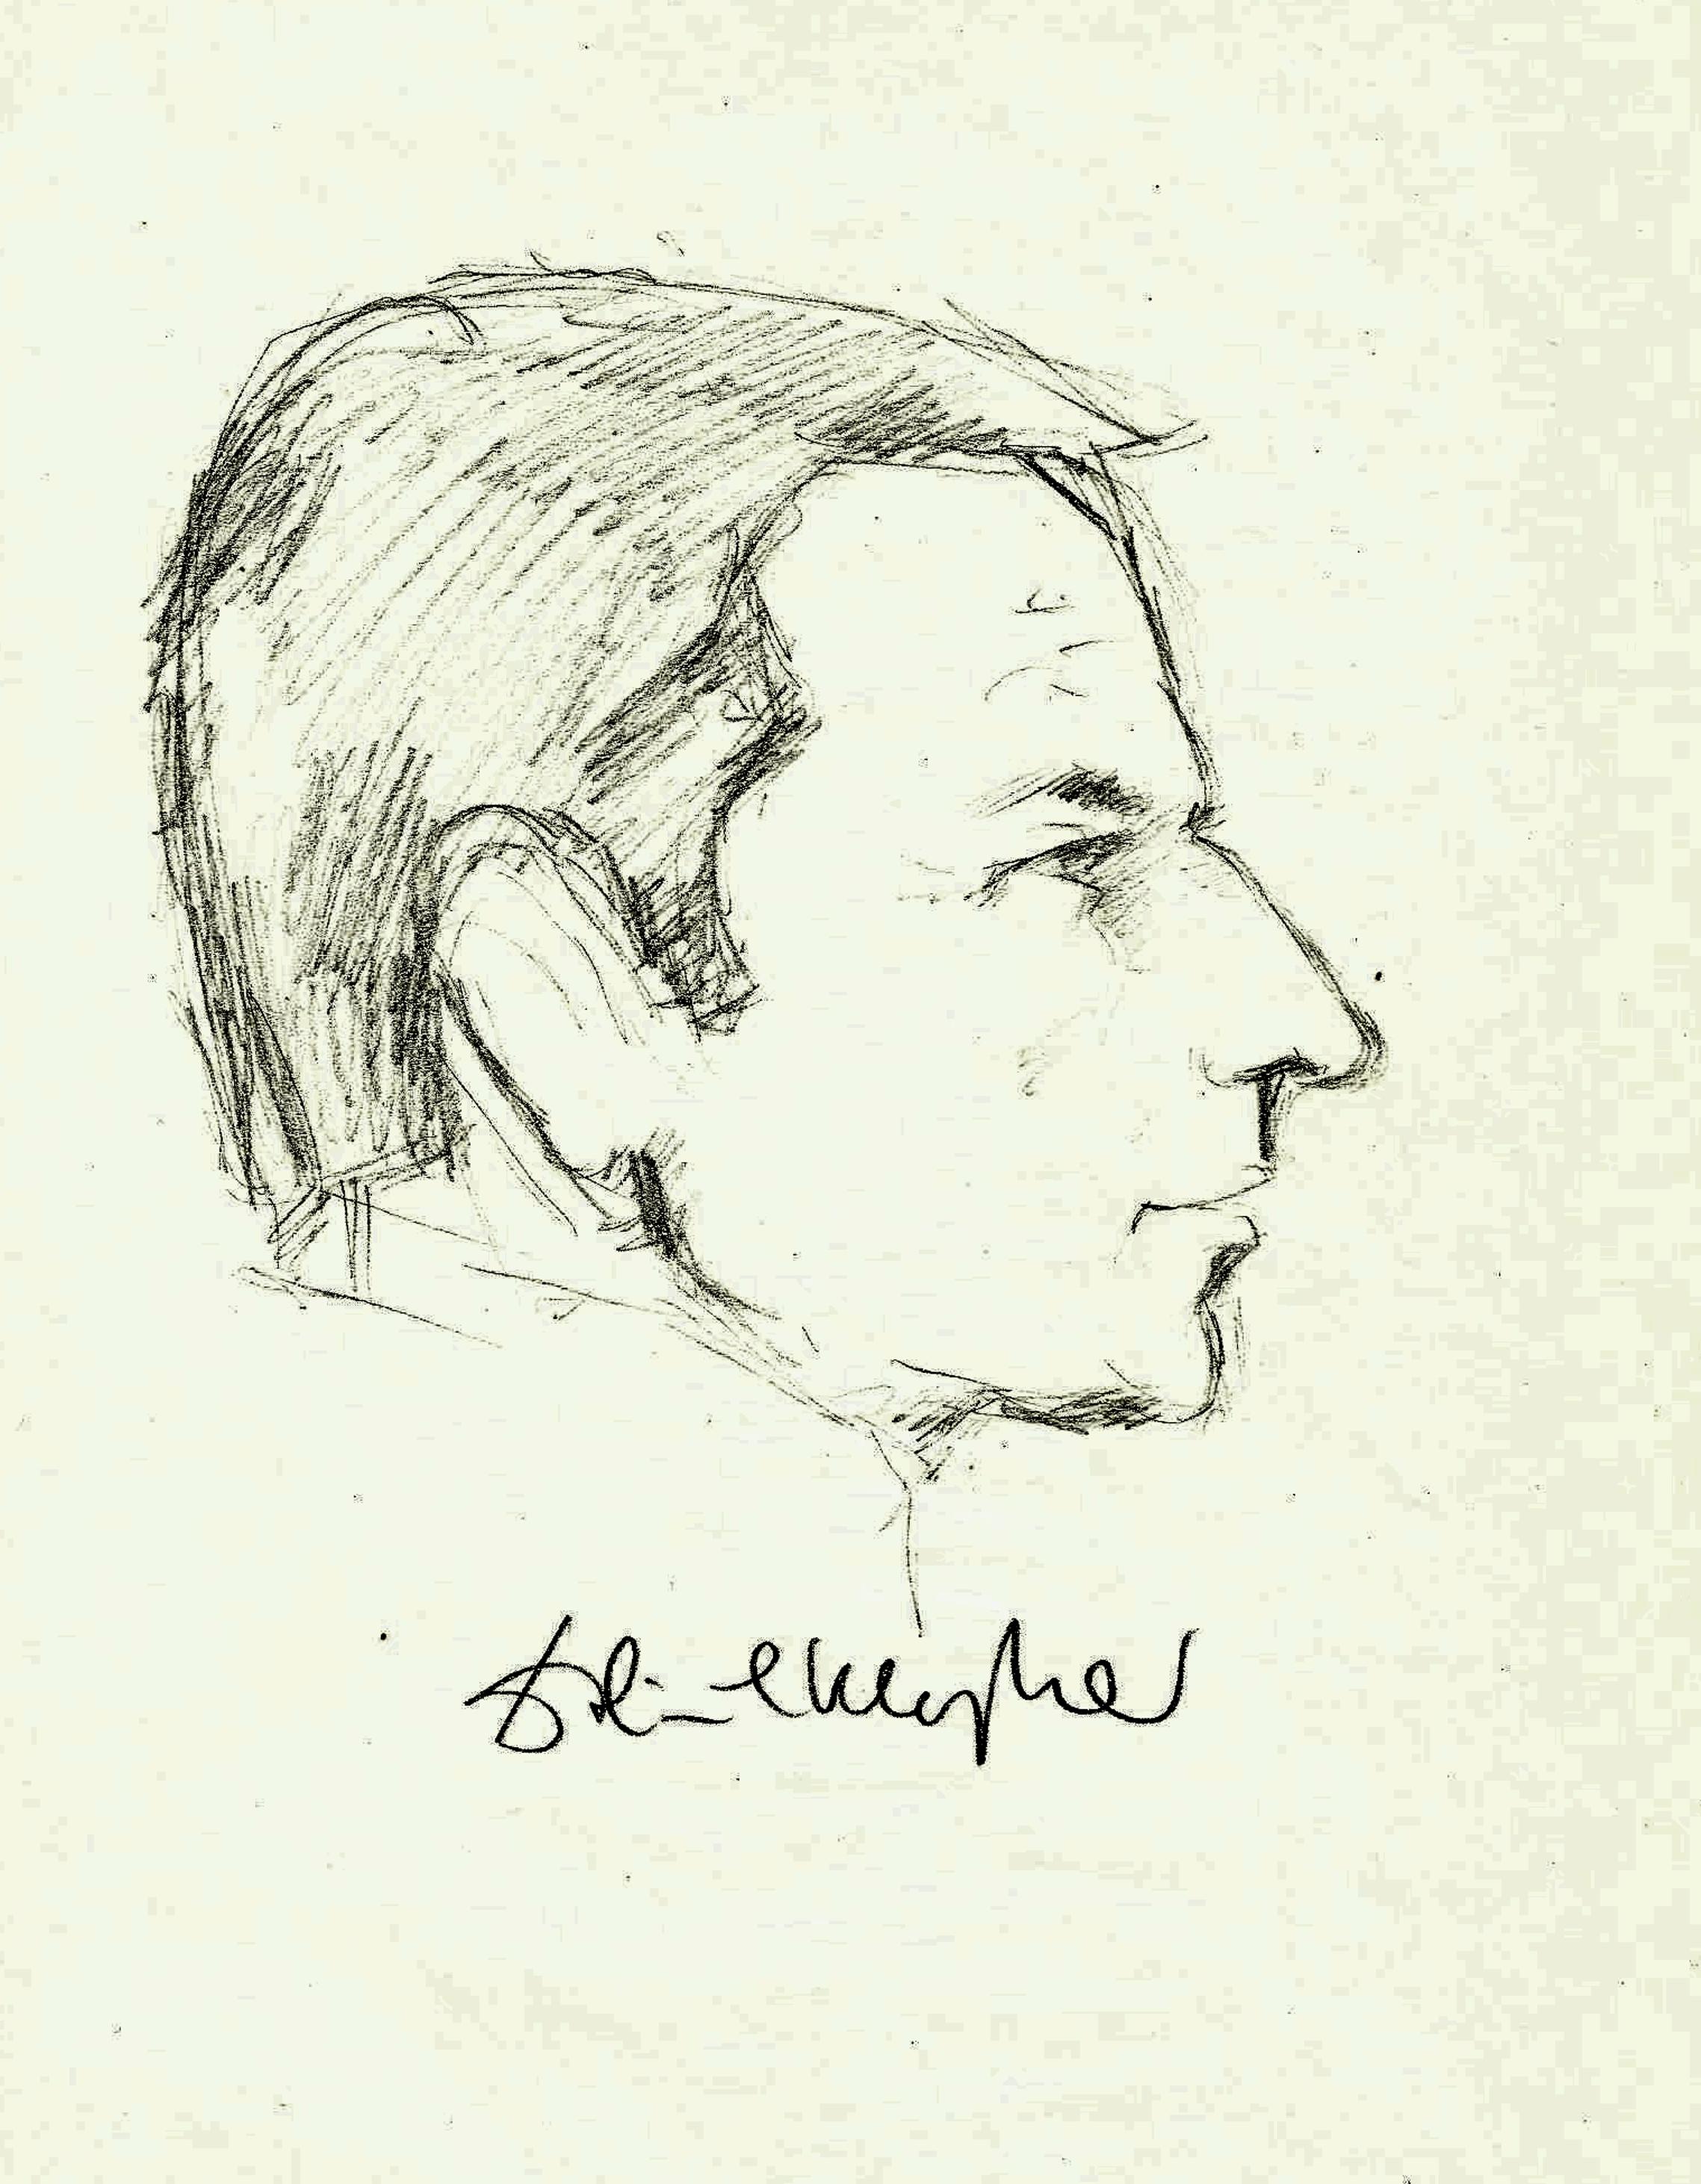 Herec Dalimil Klapka